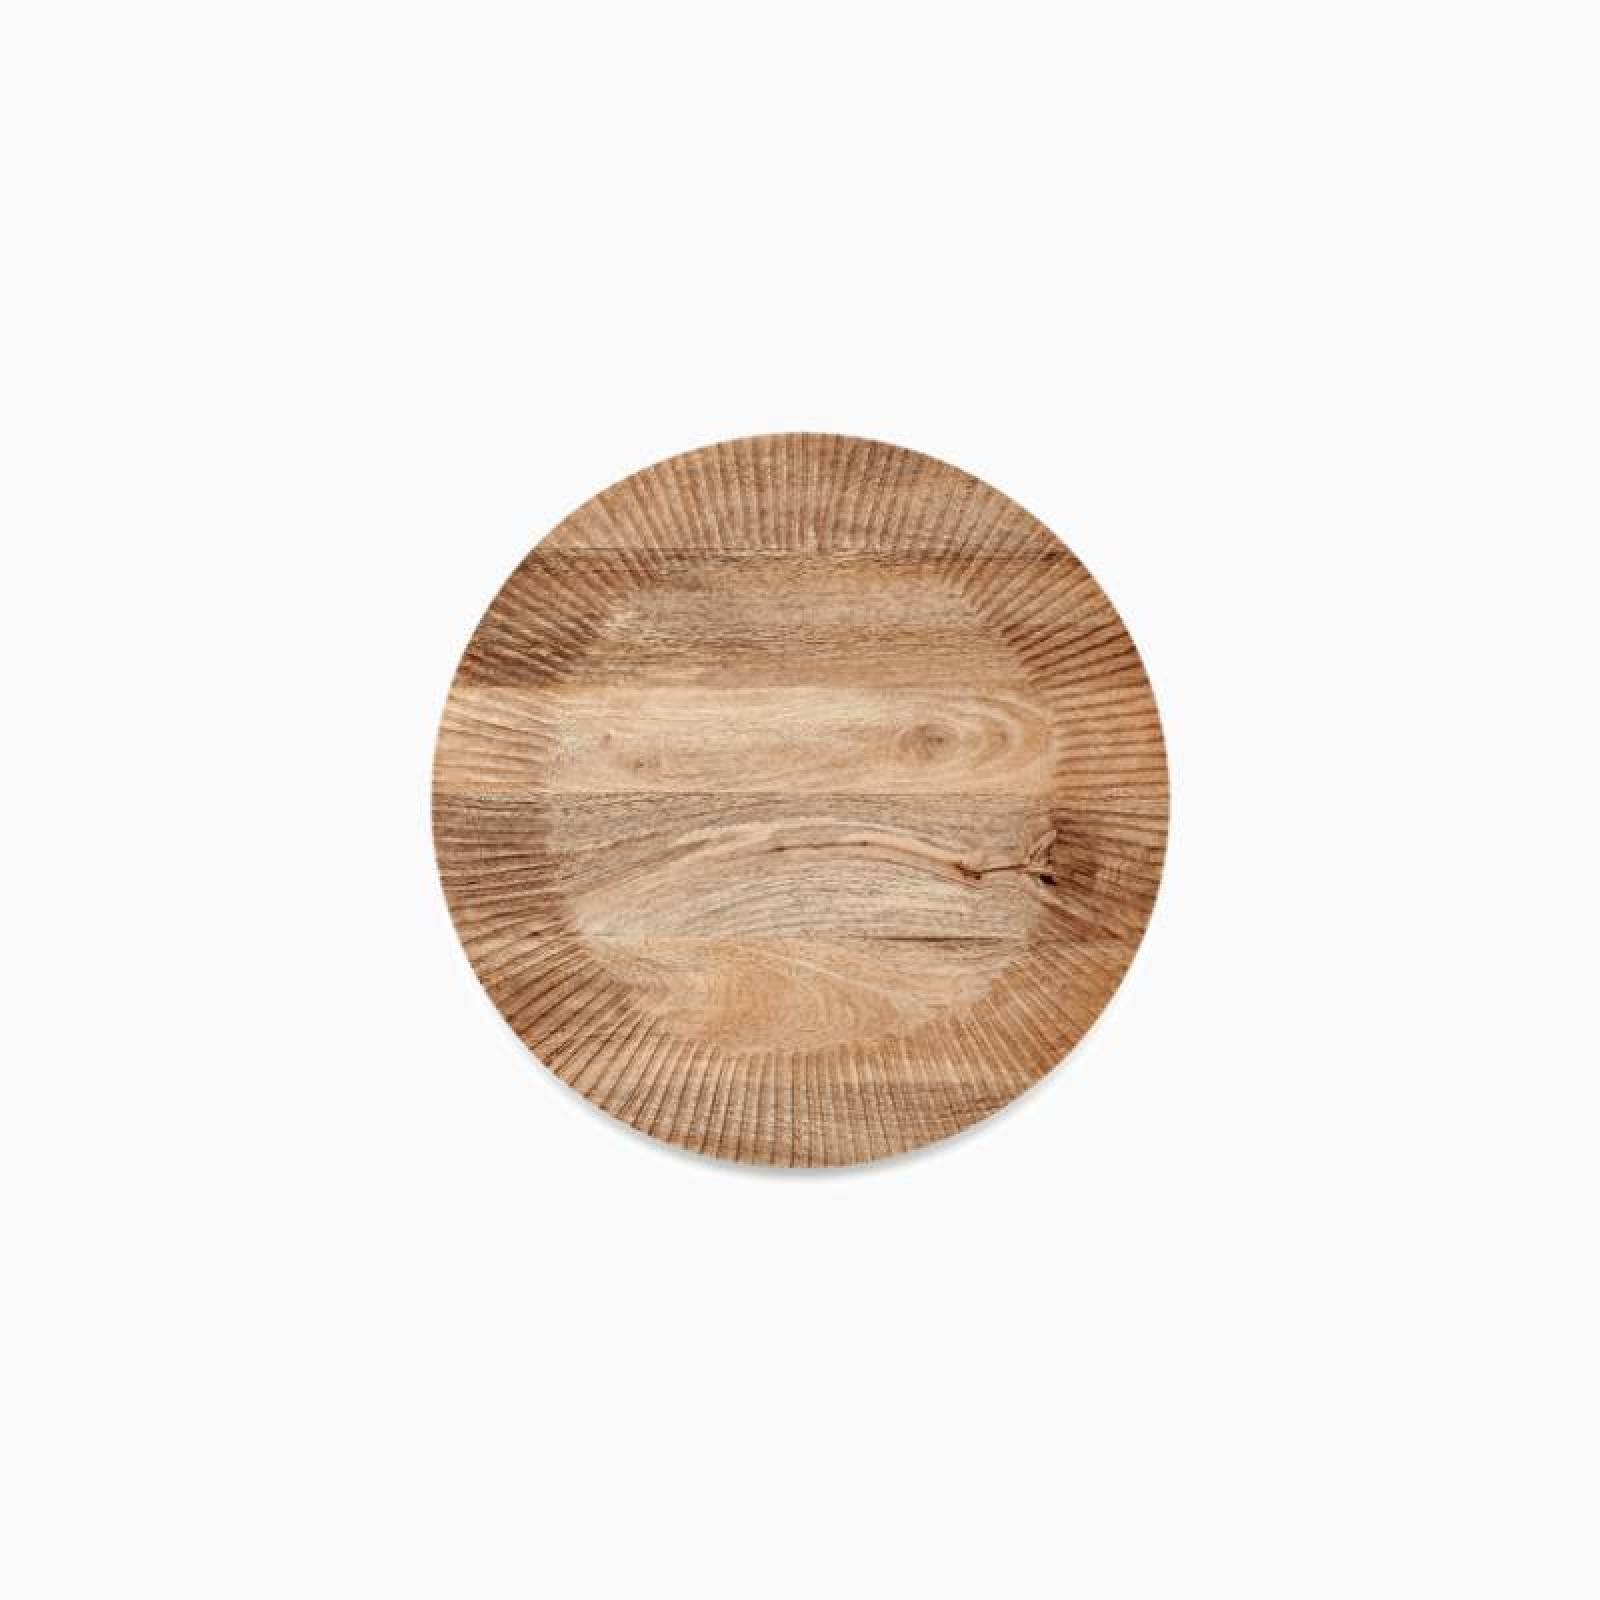 Medium Sunburst Wooden Chopping Board